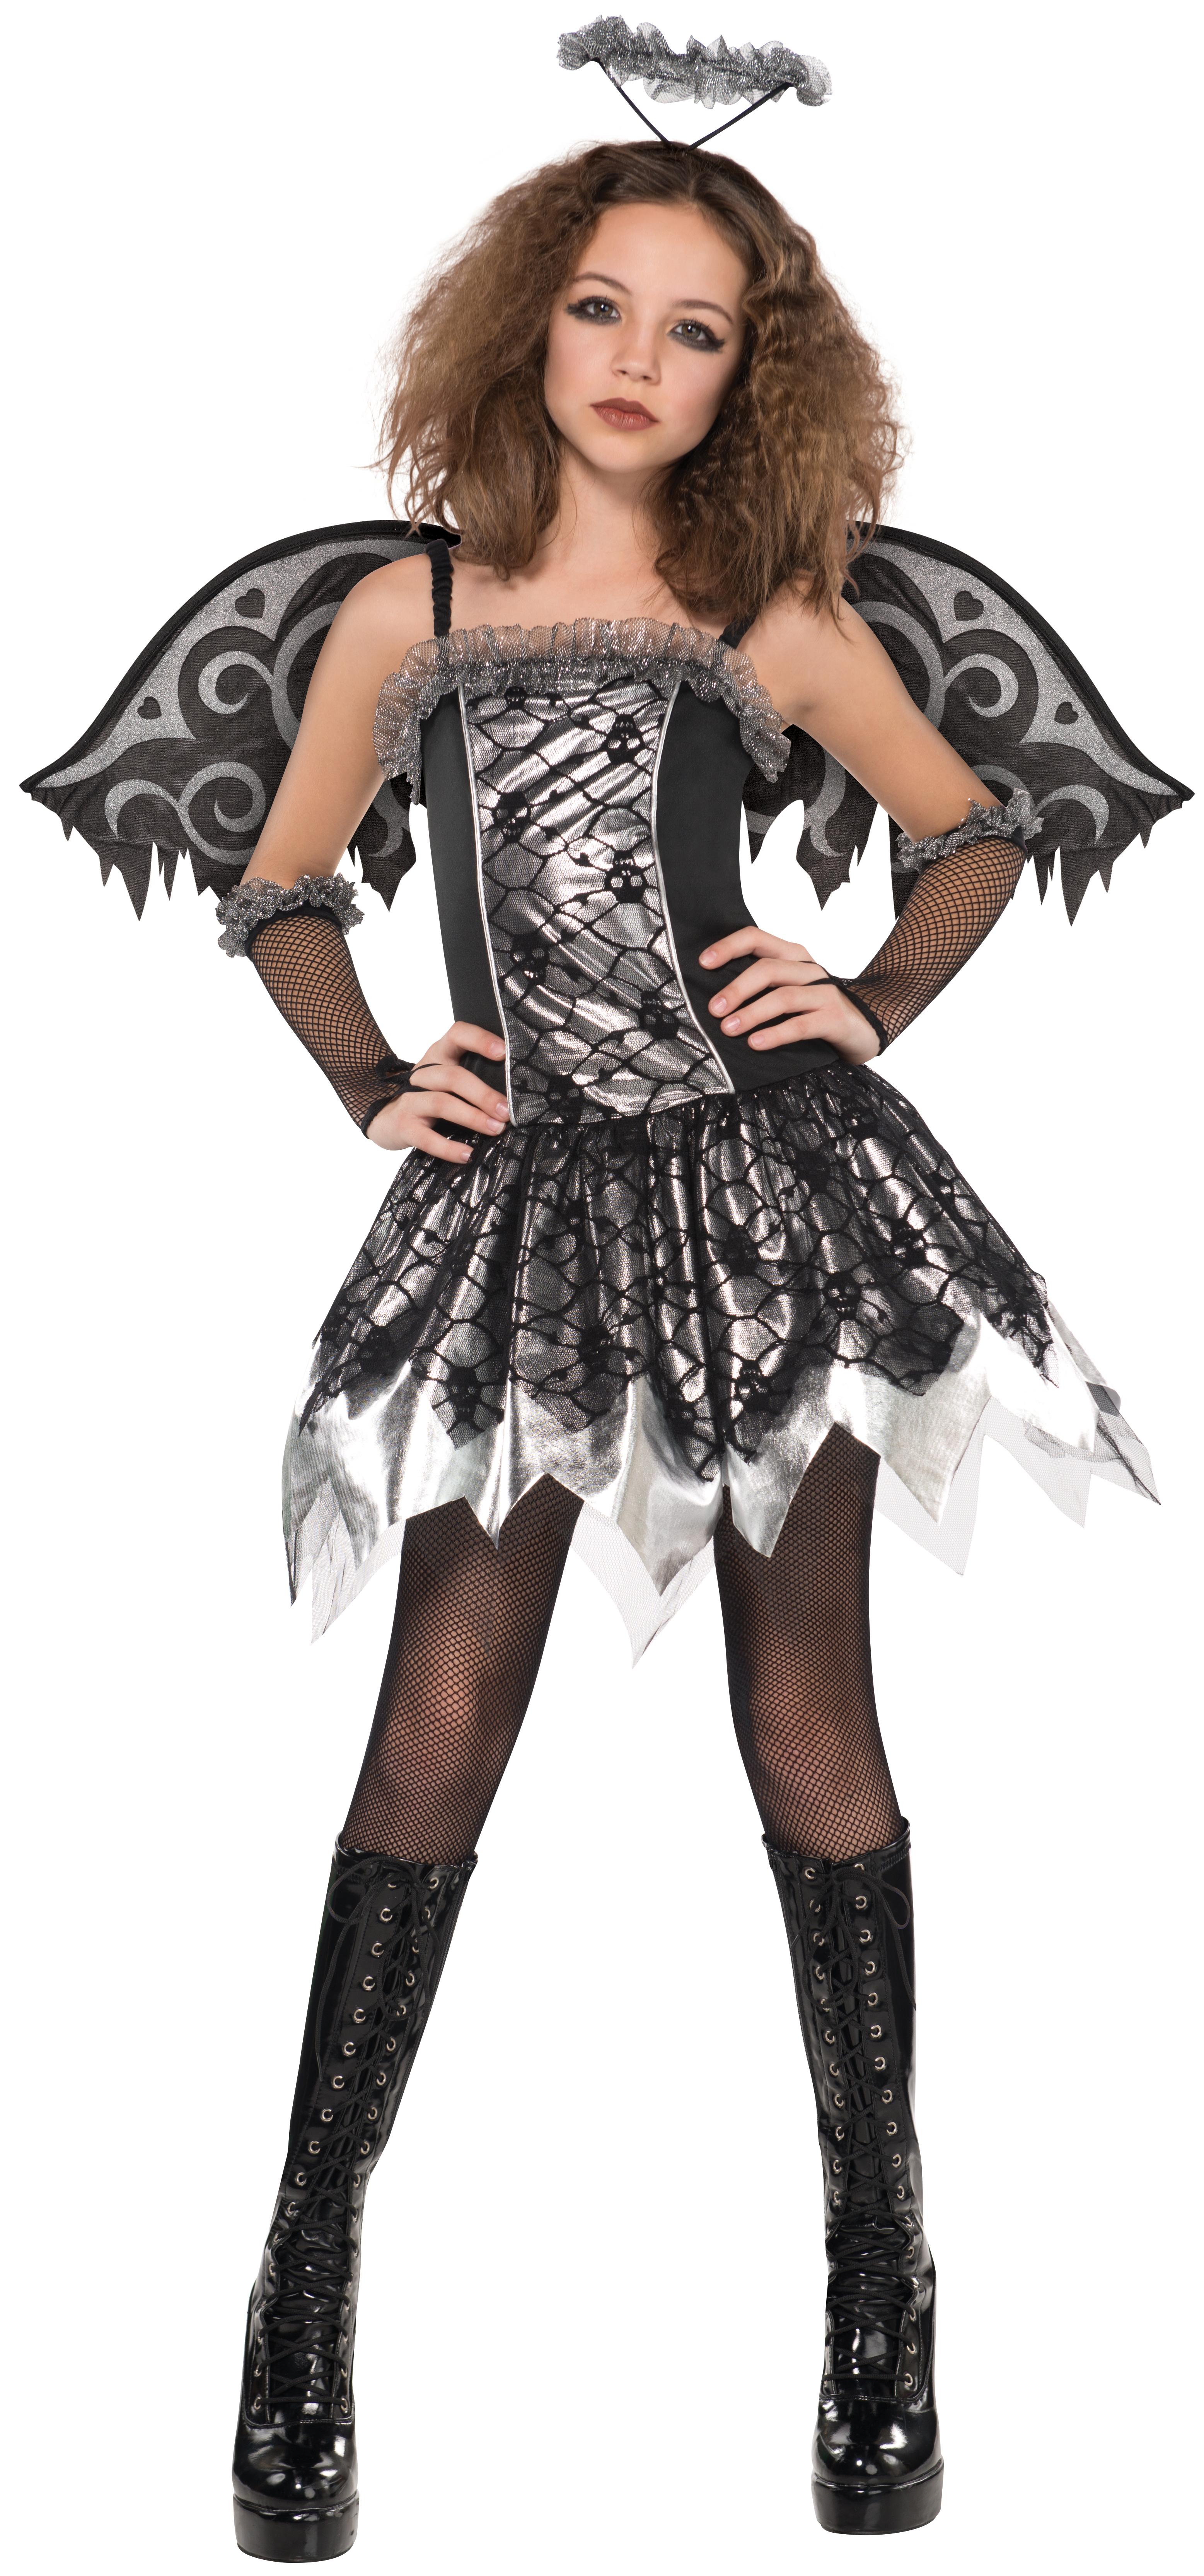 Girls Age 8-16 Fancy Dress Halloween Party Kids Childs Teen ...